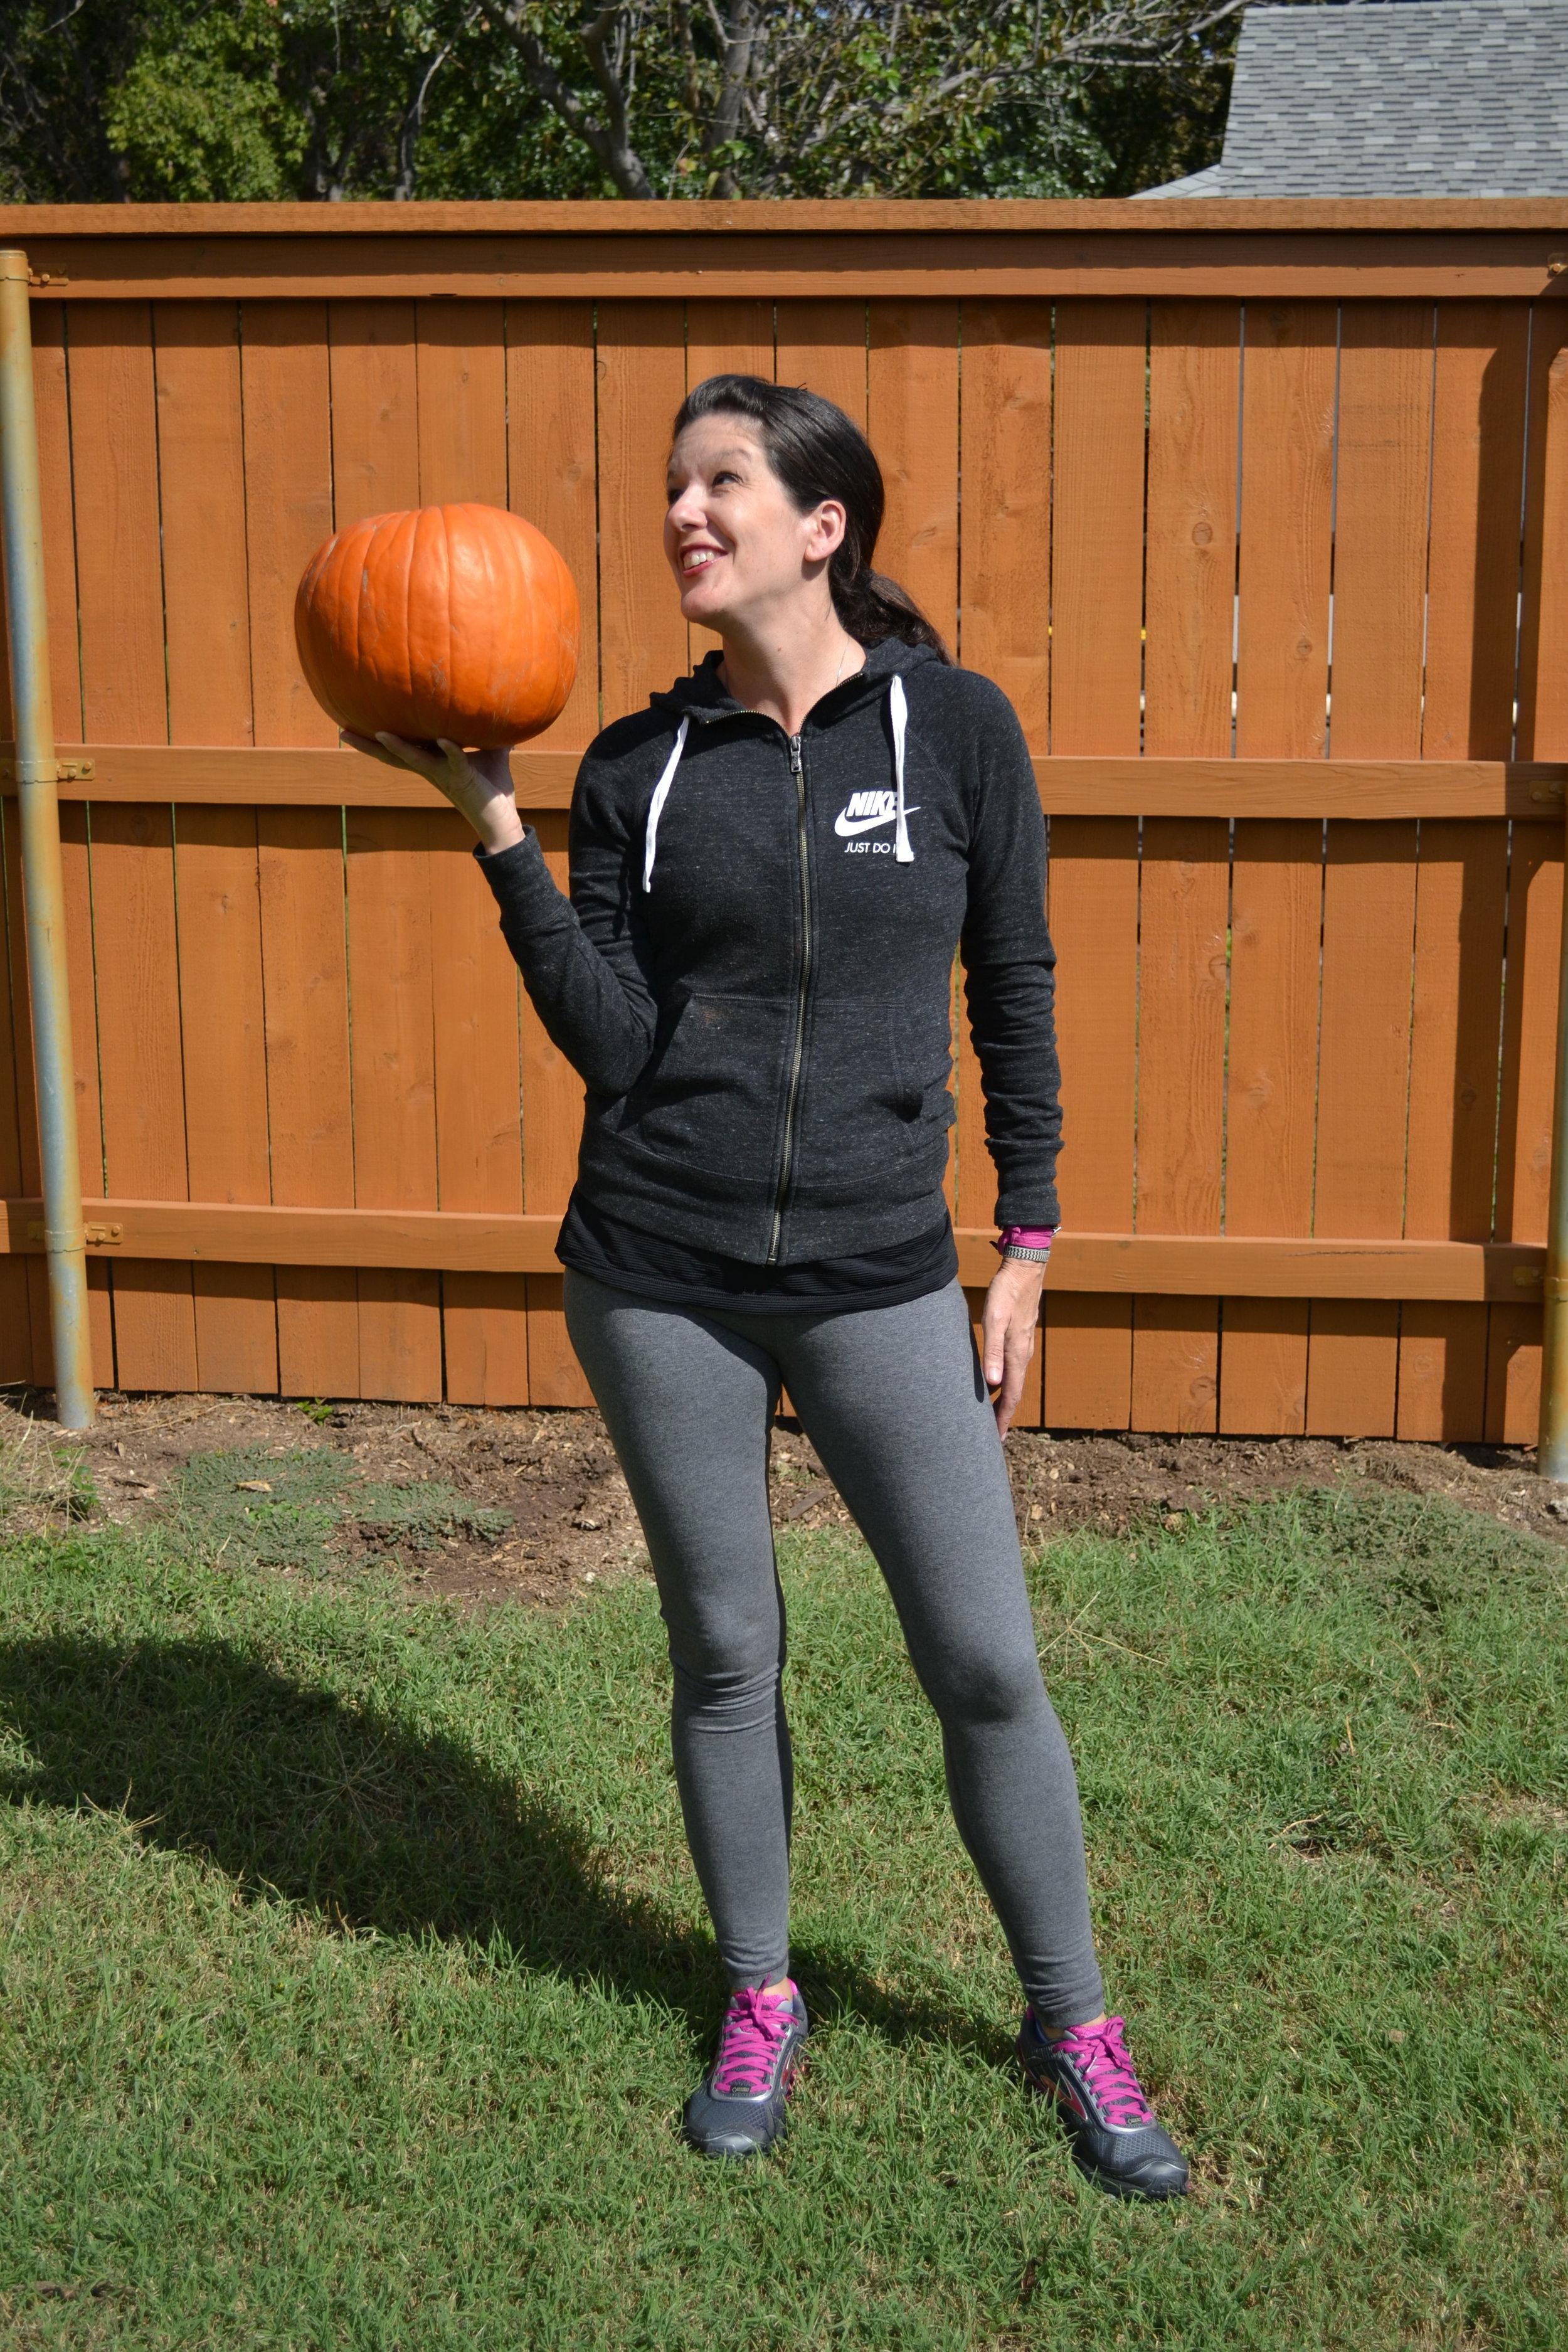 Pumpkin or medicine ball...you decide.